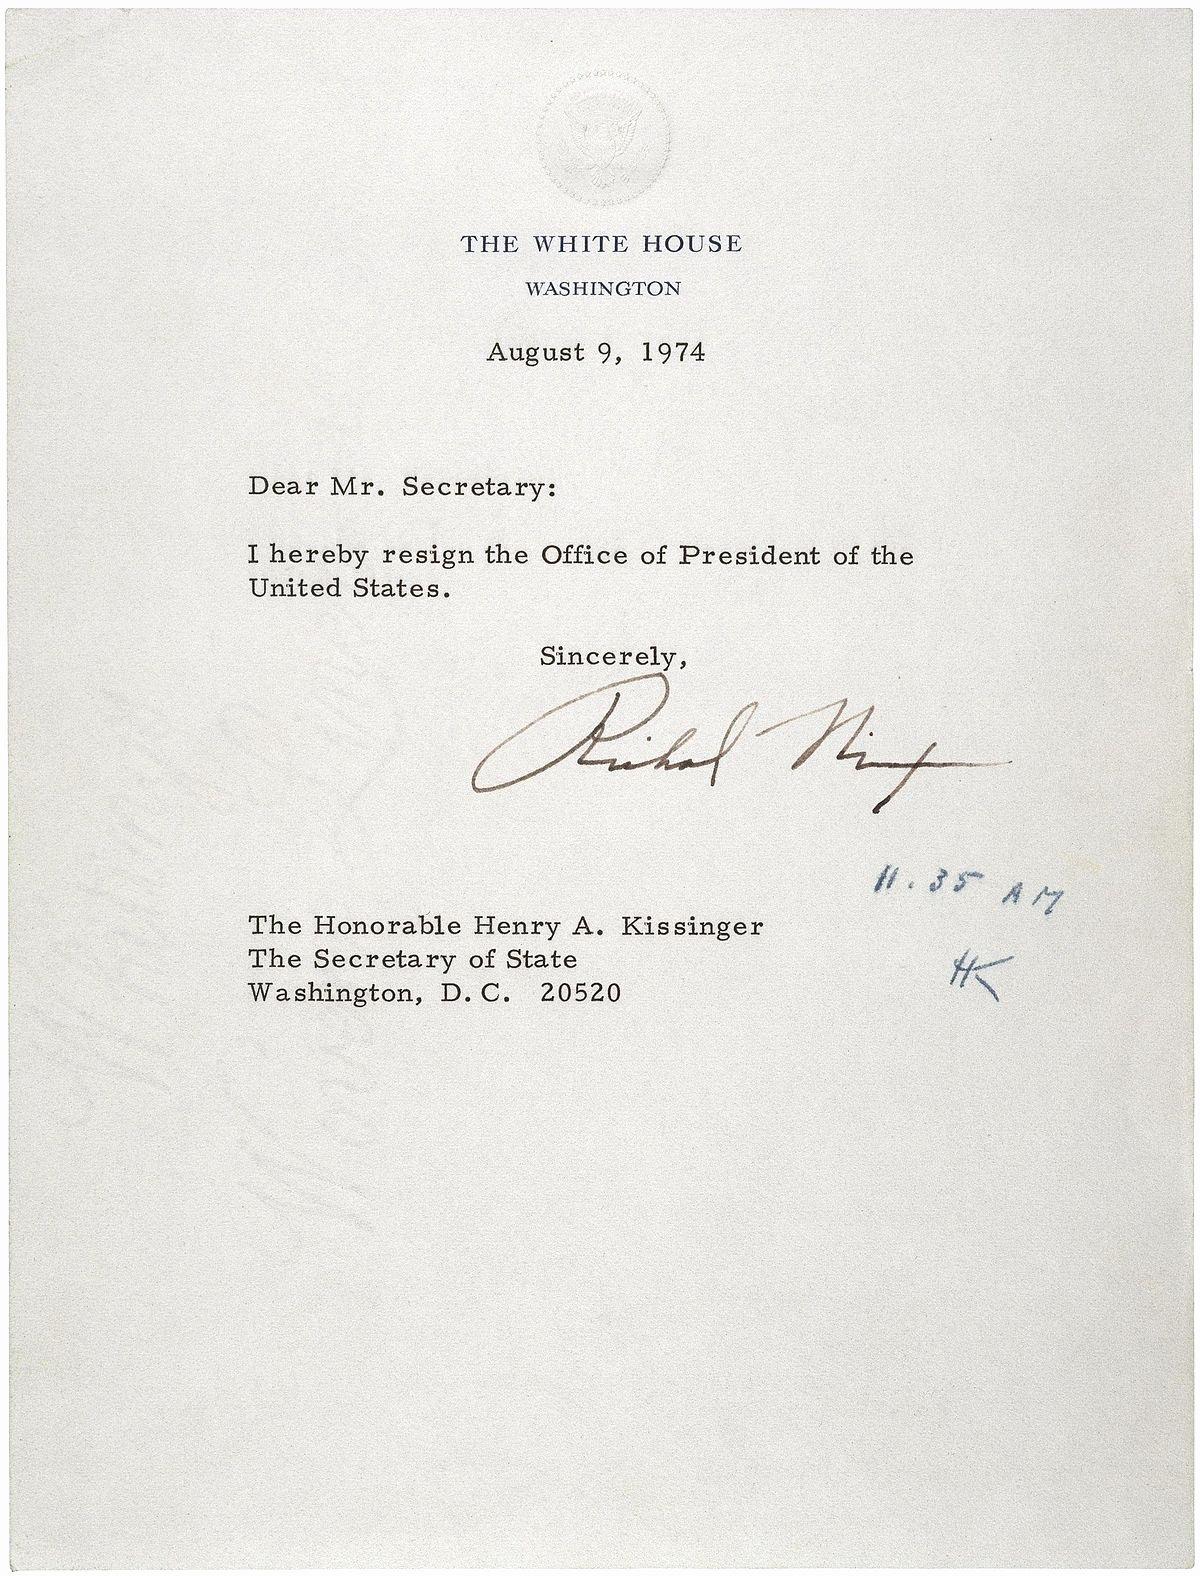 Form Letter Of Resignation Best Of Letter Of Resignation